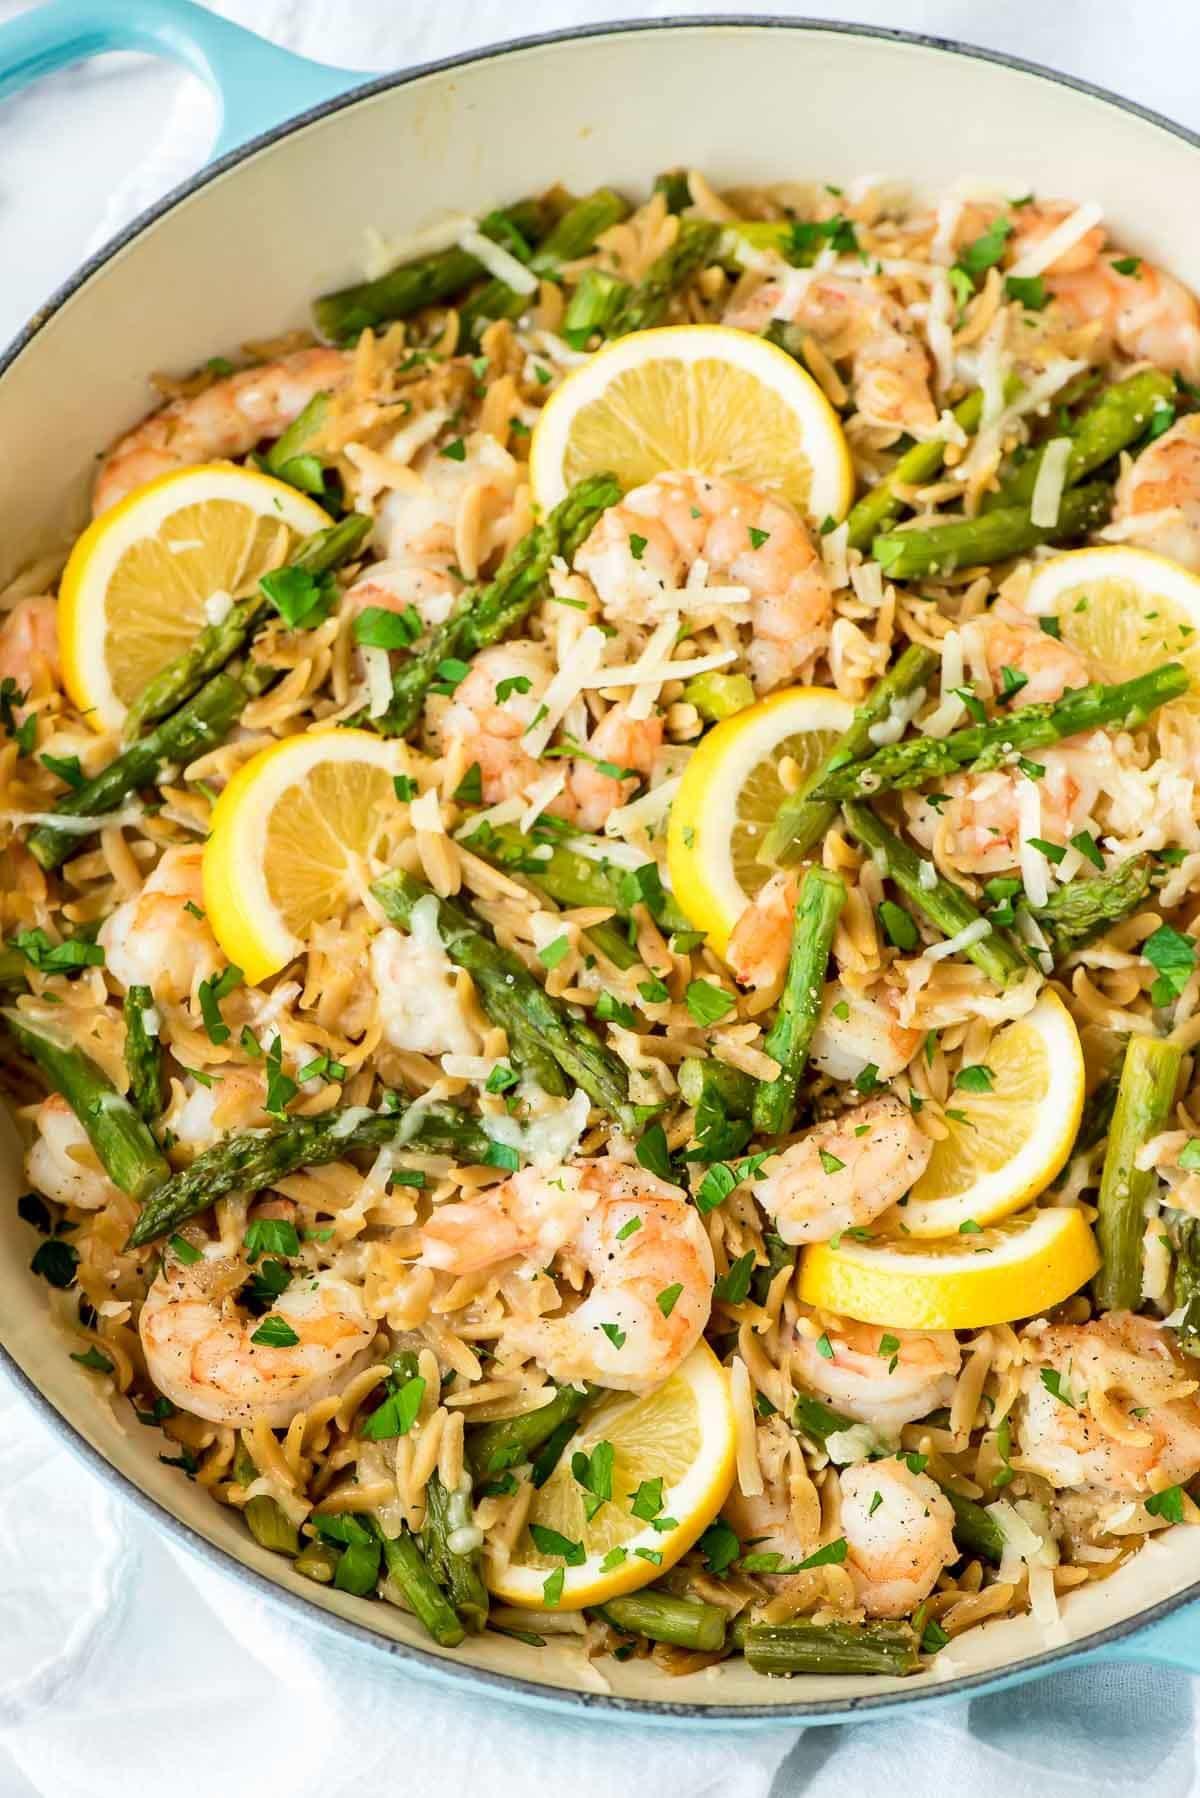 Shrimp Pasta Healthy  Lemon Shrimp Pasta with Orzo and Asparagus